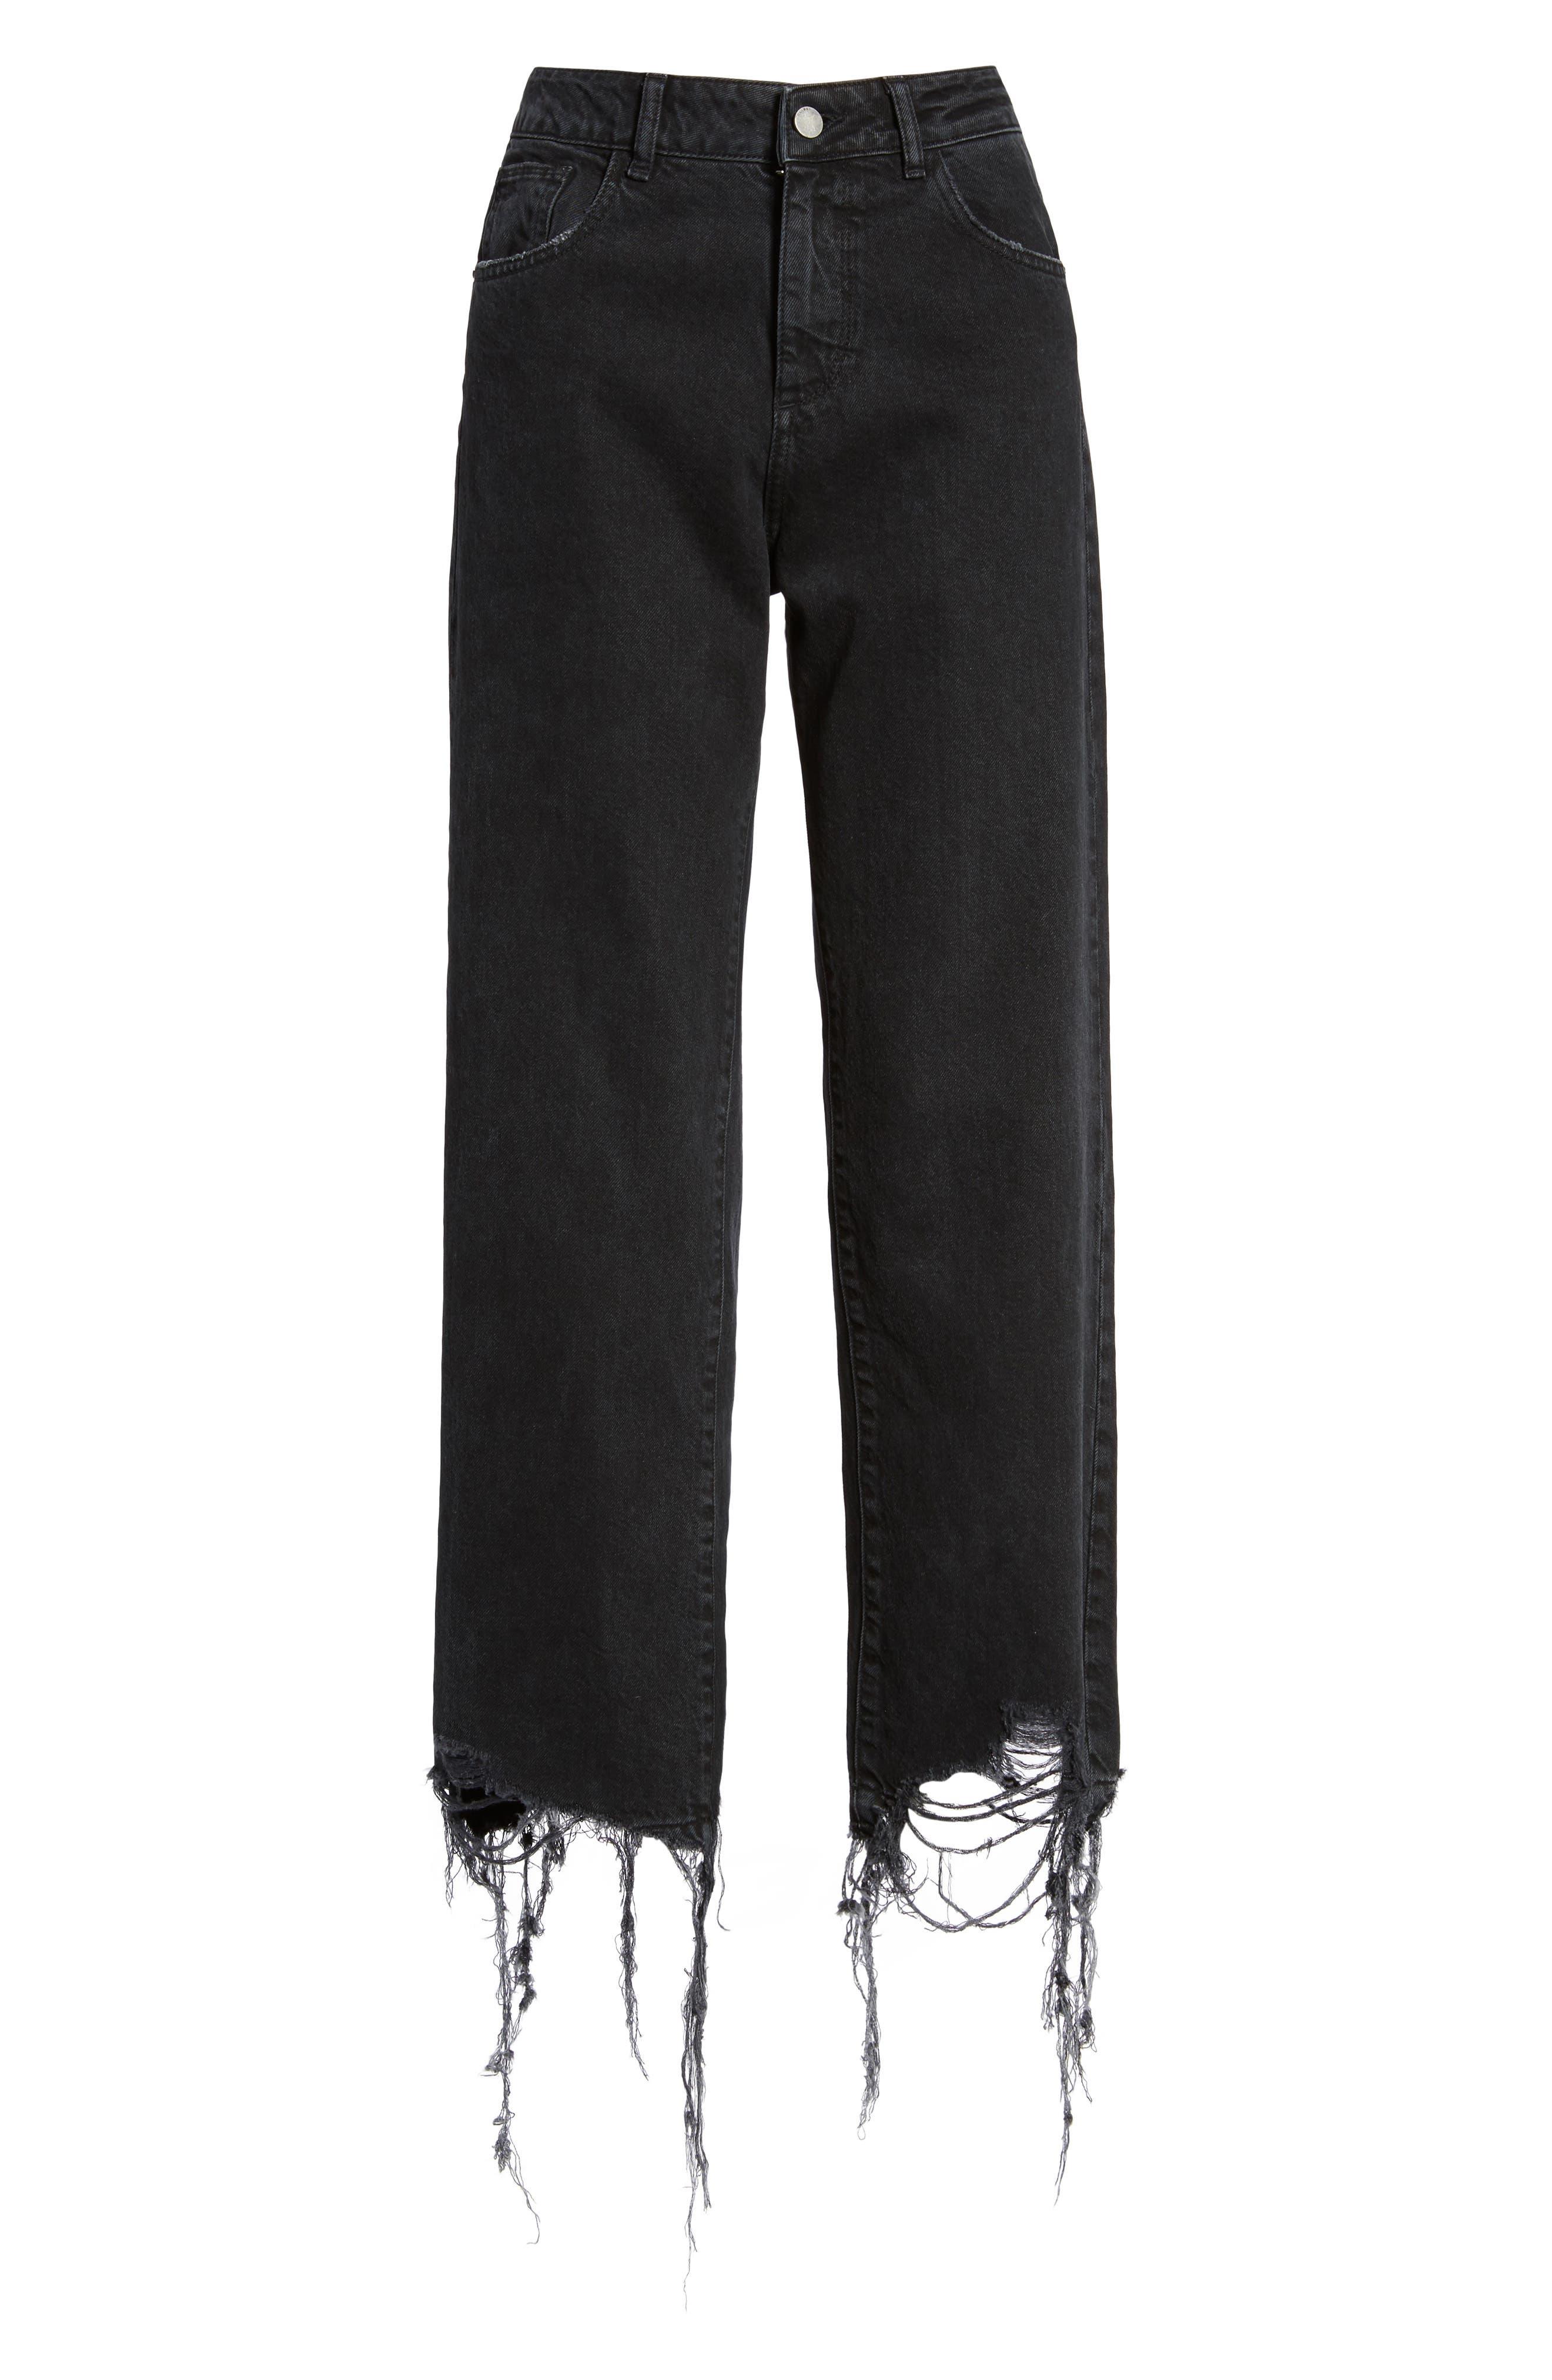 Hepburn High Waist Wide Leg Jeans,                             Alternate thumbnail 6, color,                             Savannah Destroy